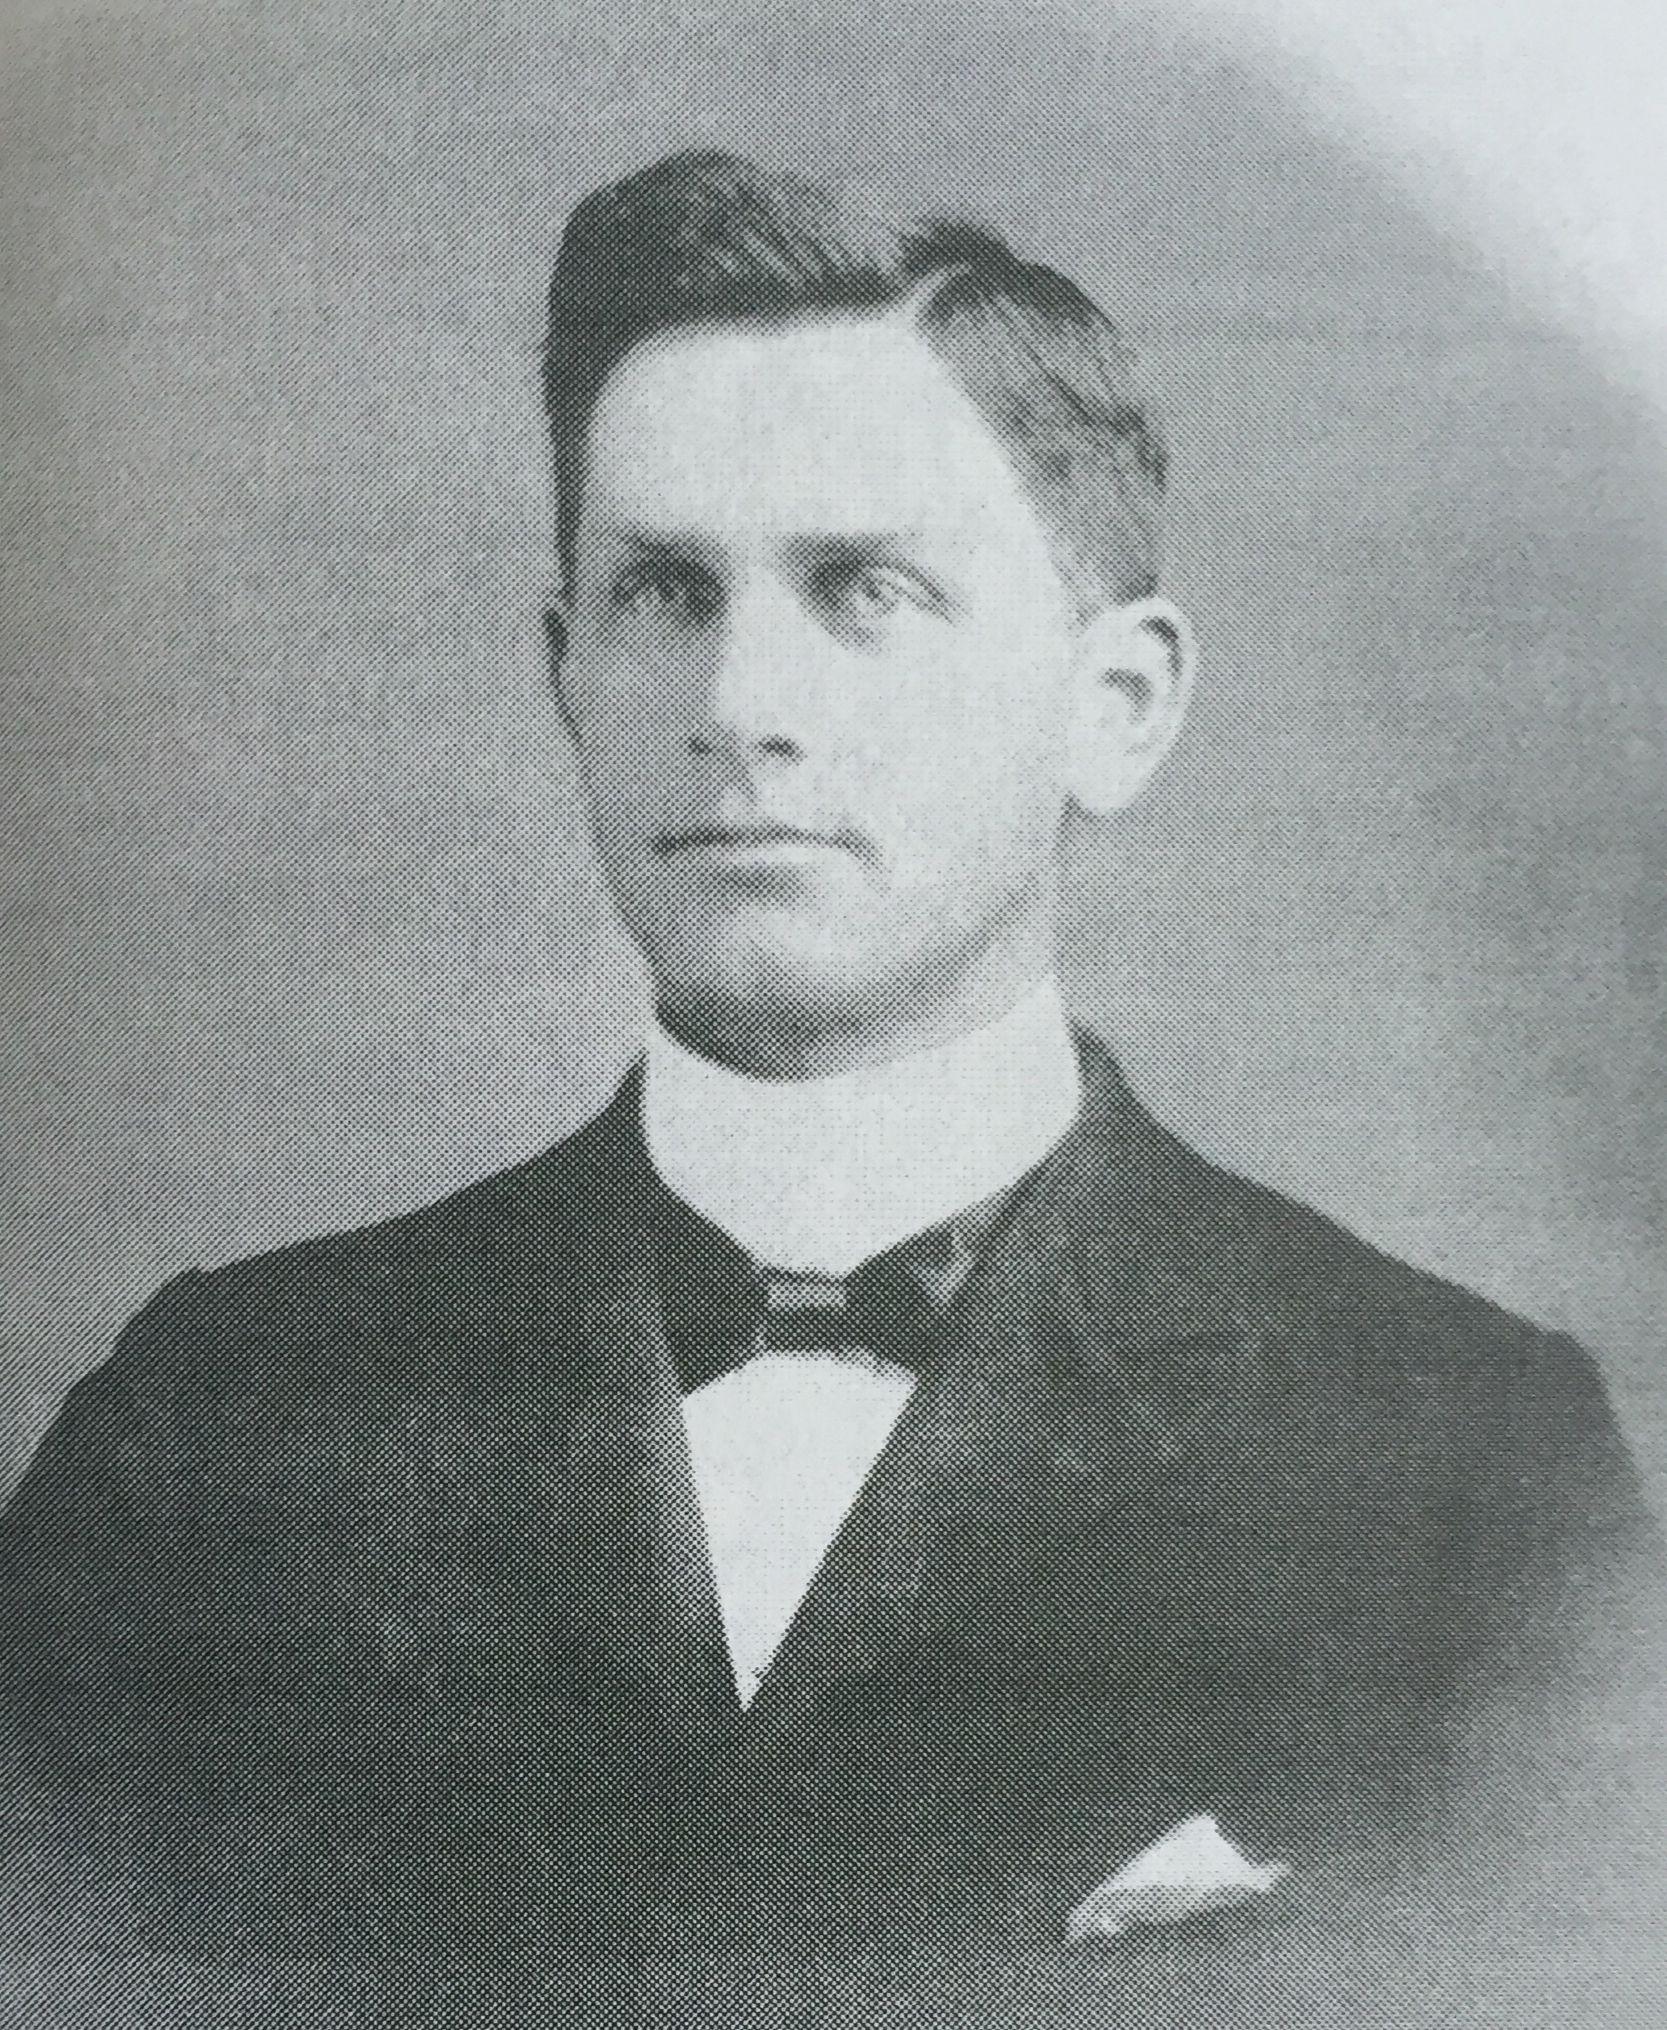 Allen, James Cyrus